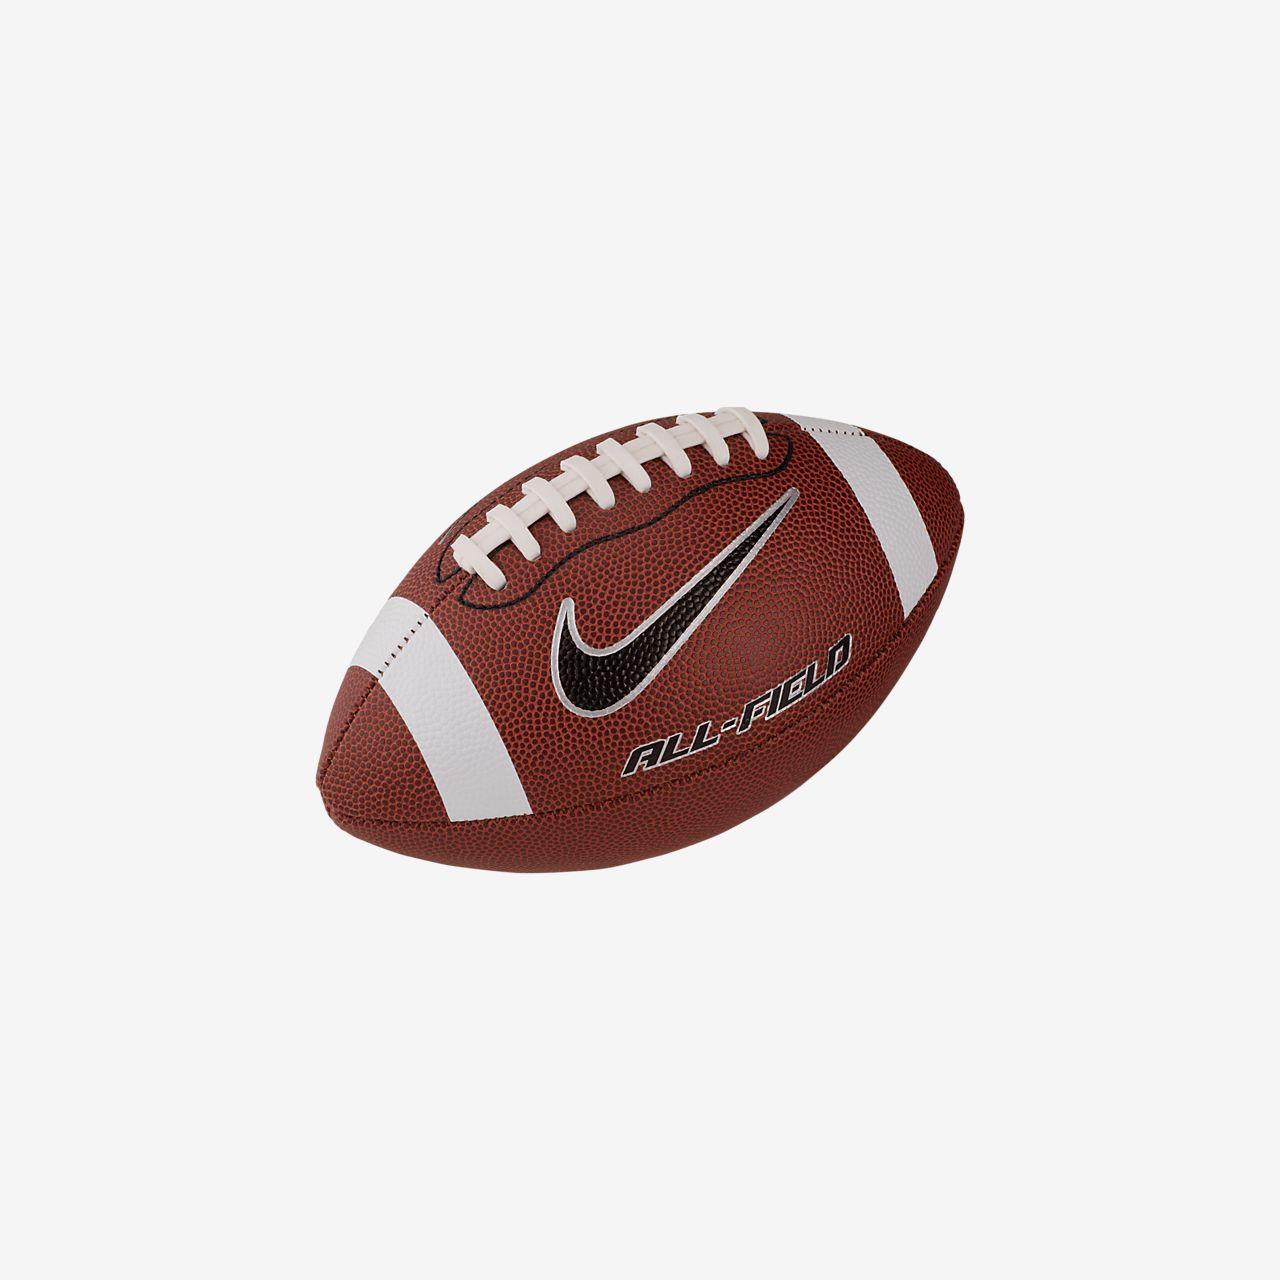 exclusive range picked up skate shoes Ballon de football américain Nike All-Field 3.0